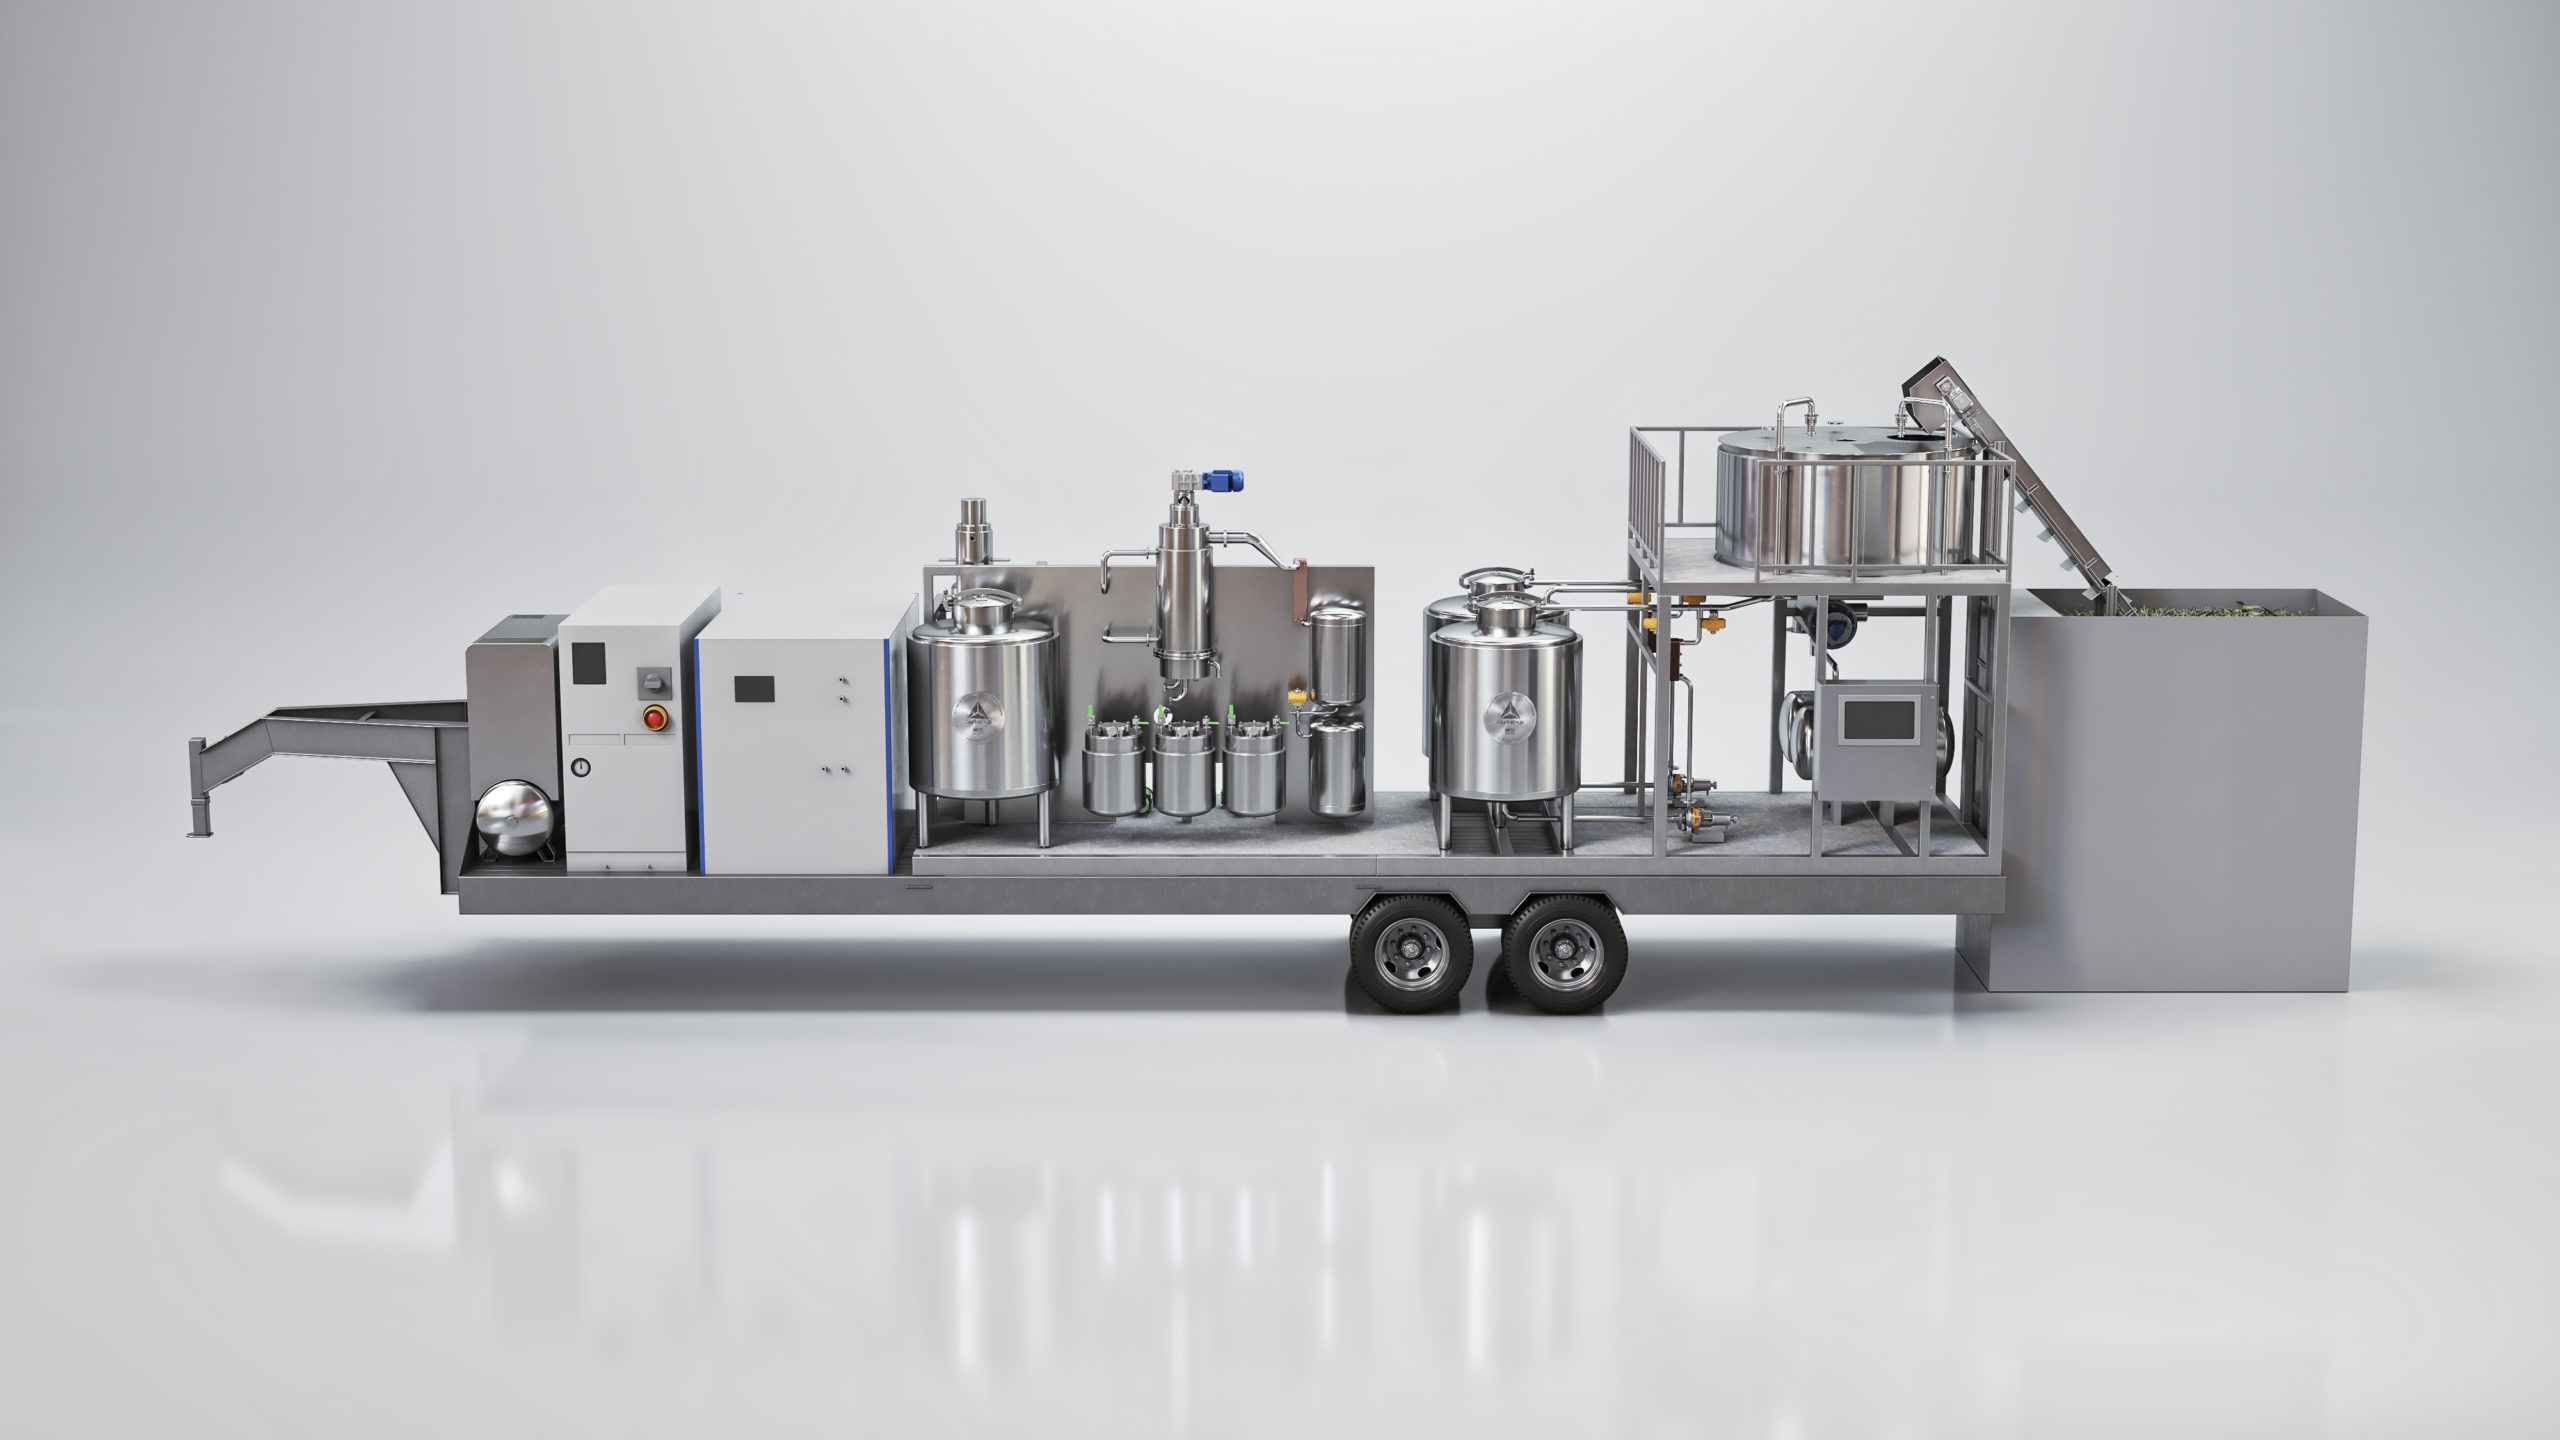 Entexs Midi Mobile Ethanol Hemp Extraction System | Best CBD Hemp Extraction | CBG Alcohol Extraction Machine | Mobile Hemp Extraction Lab